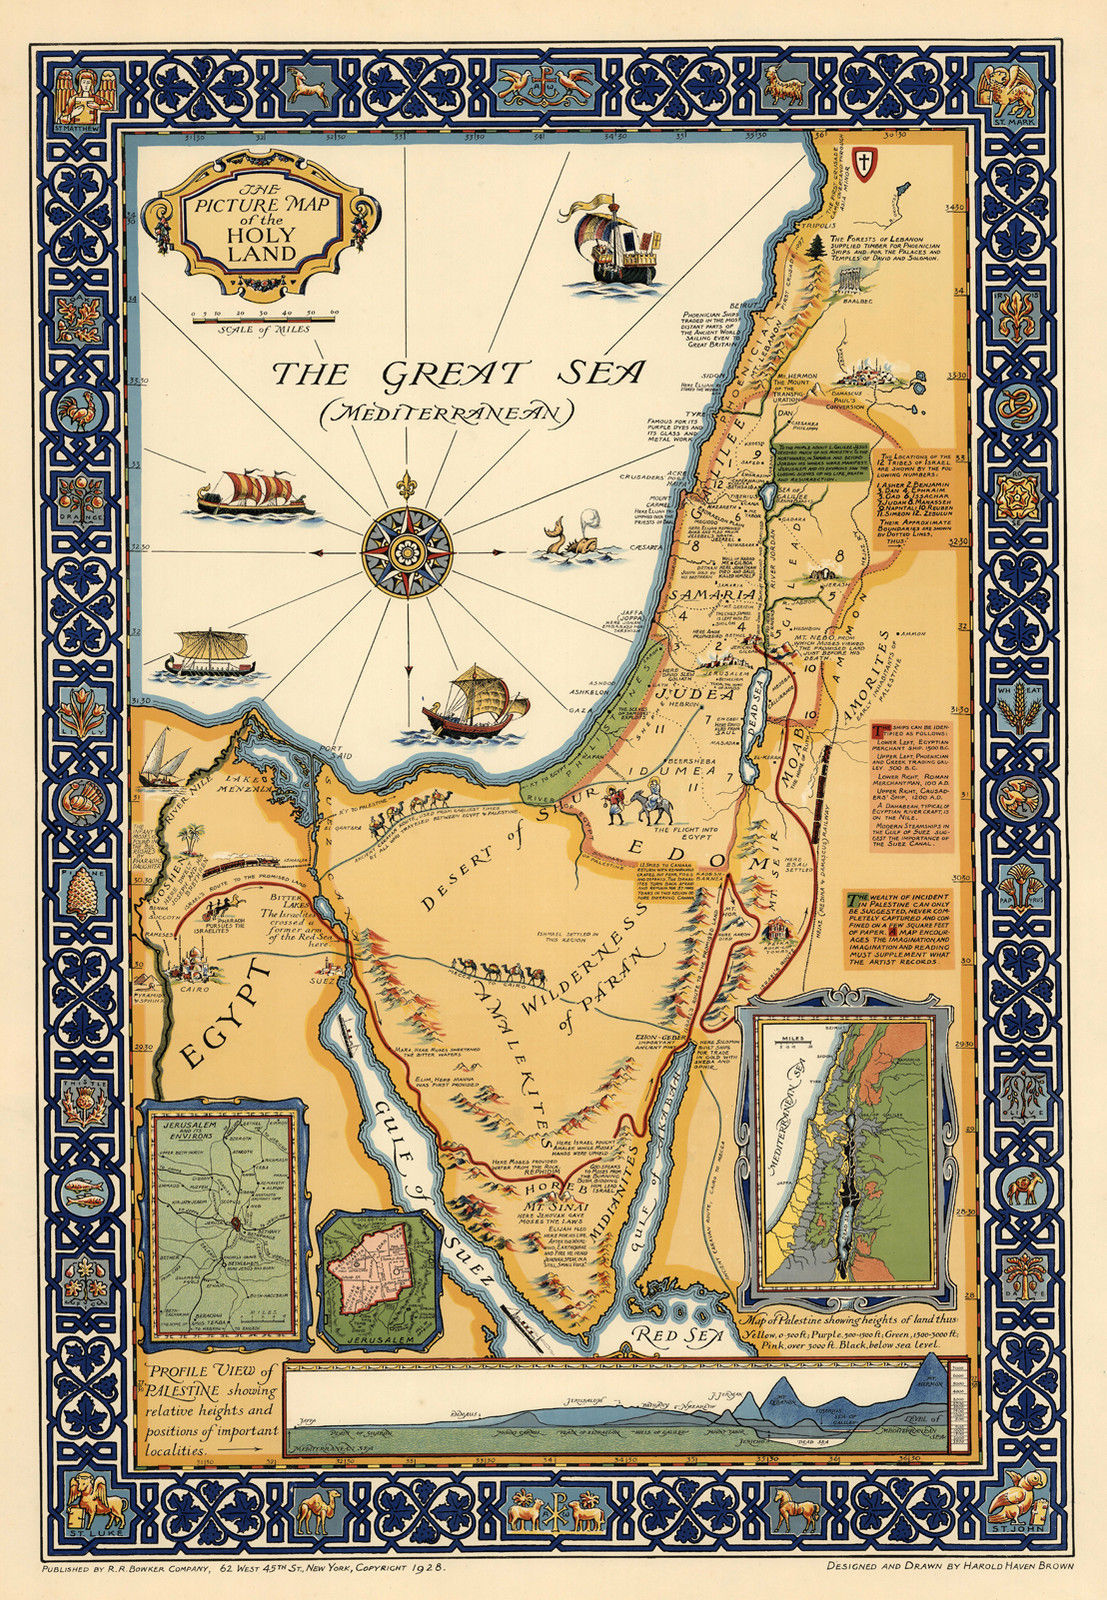 1881 Map of the Environs of Jerusalem Israel Wall Art Poster Vintage History